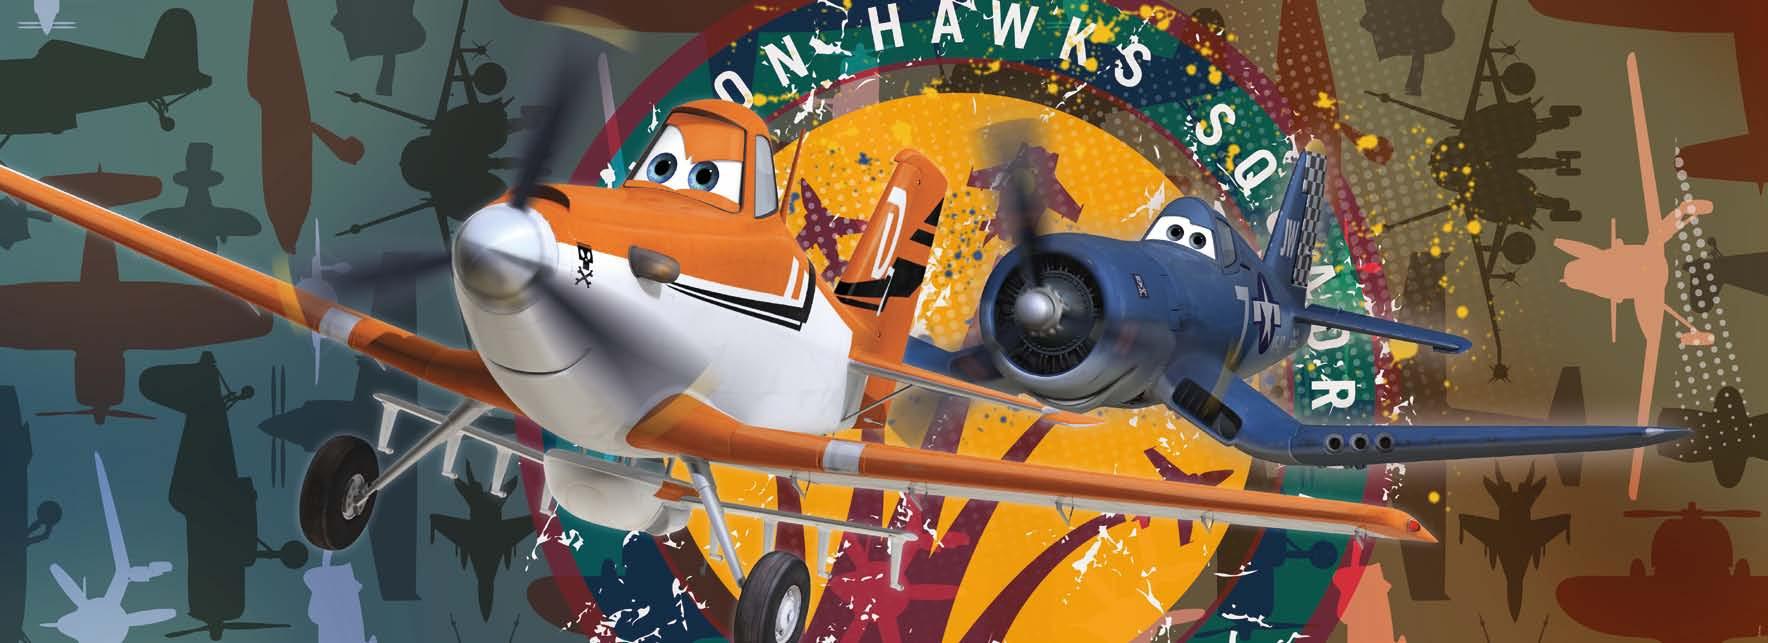 Poster mural Planes Squadron - Panoramique Disney - KOMAR